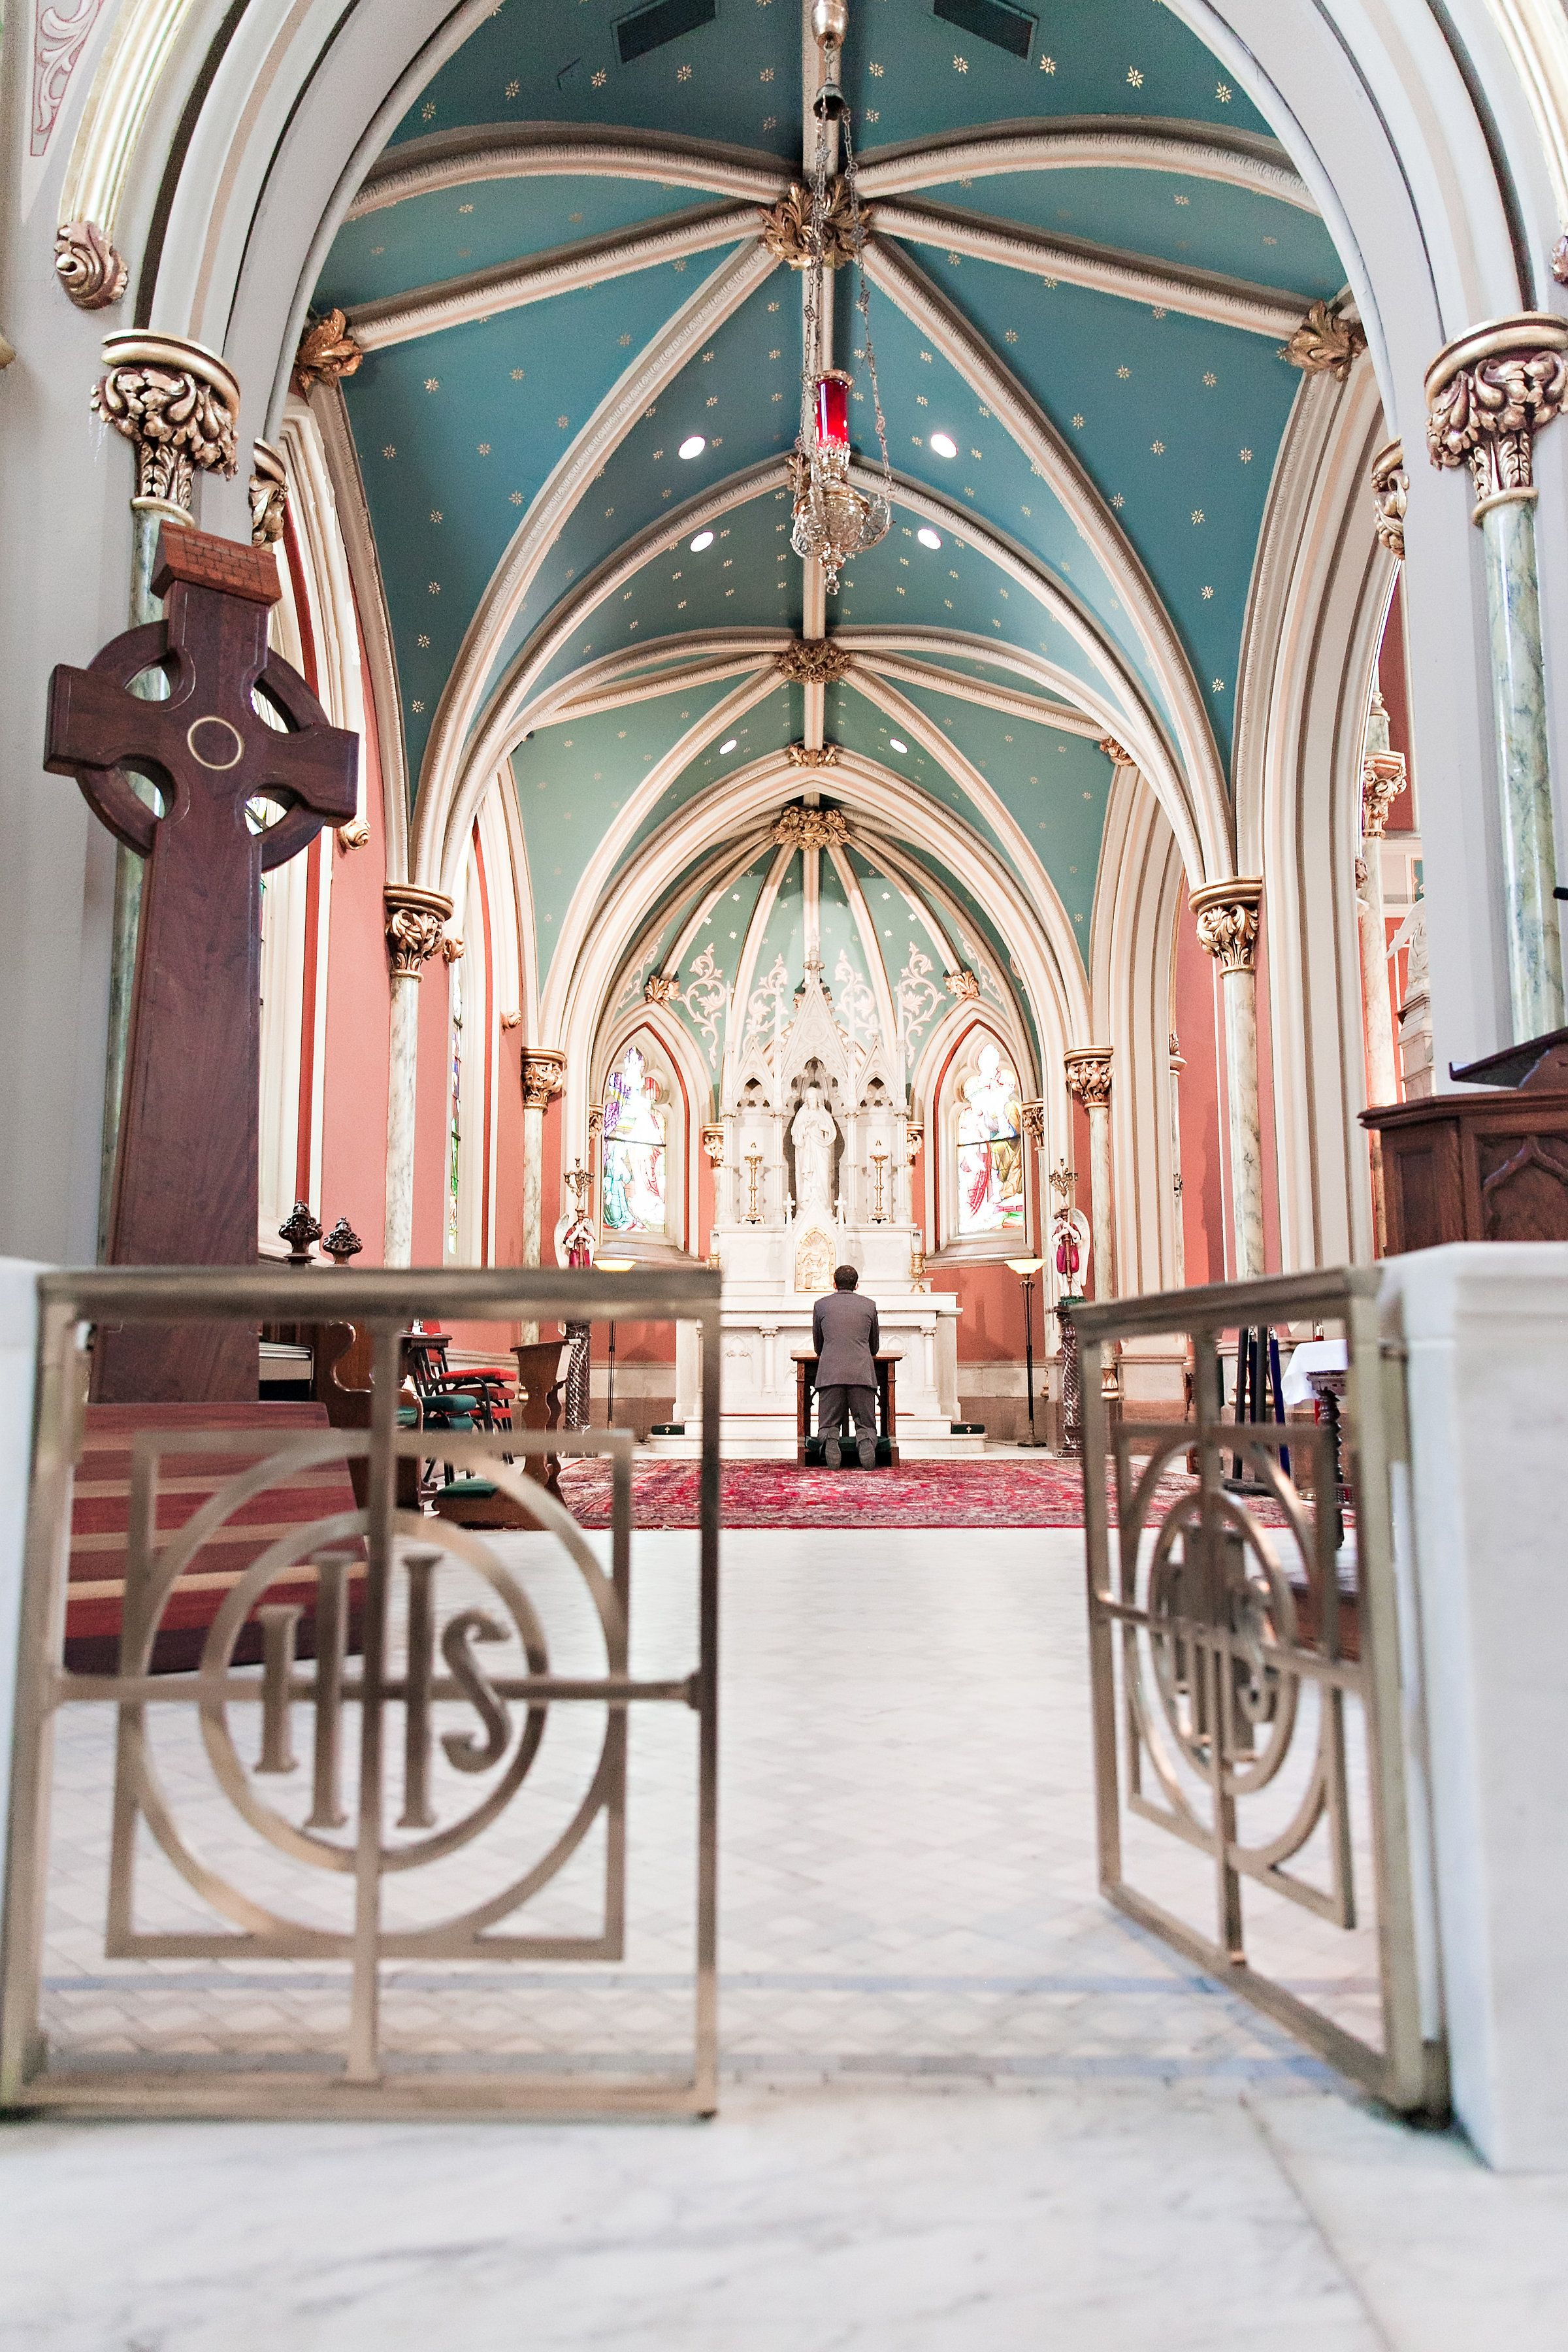 19++ Small wedding venues in savannah georgia ideas in 2021